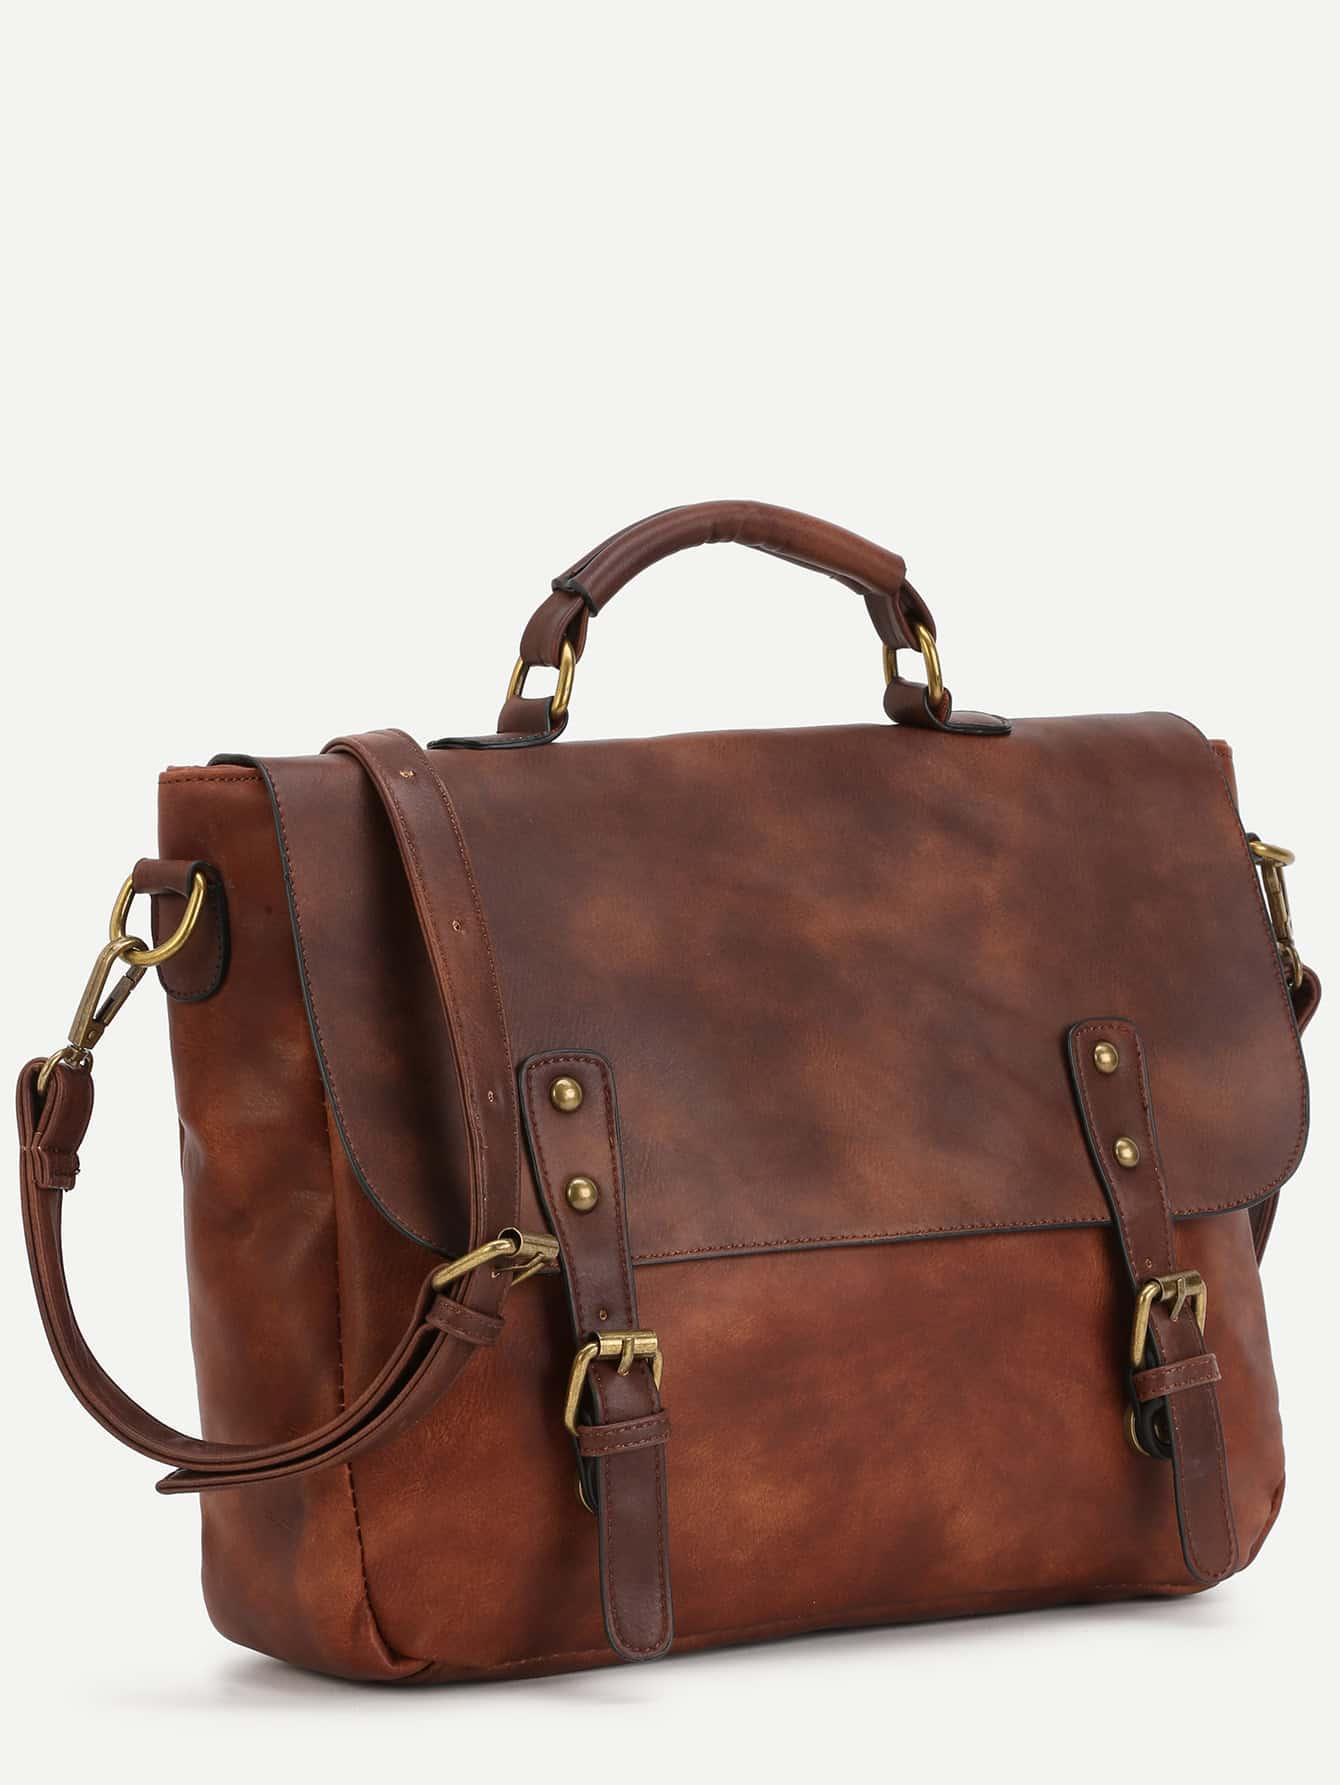 bag160921916_2